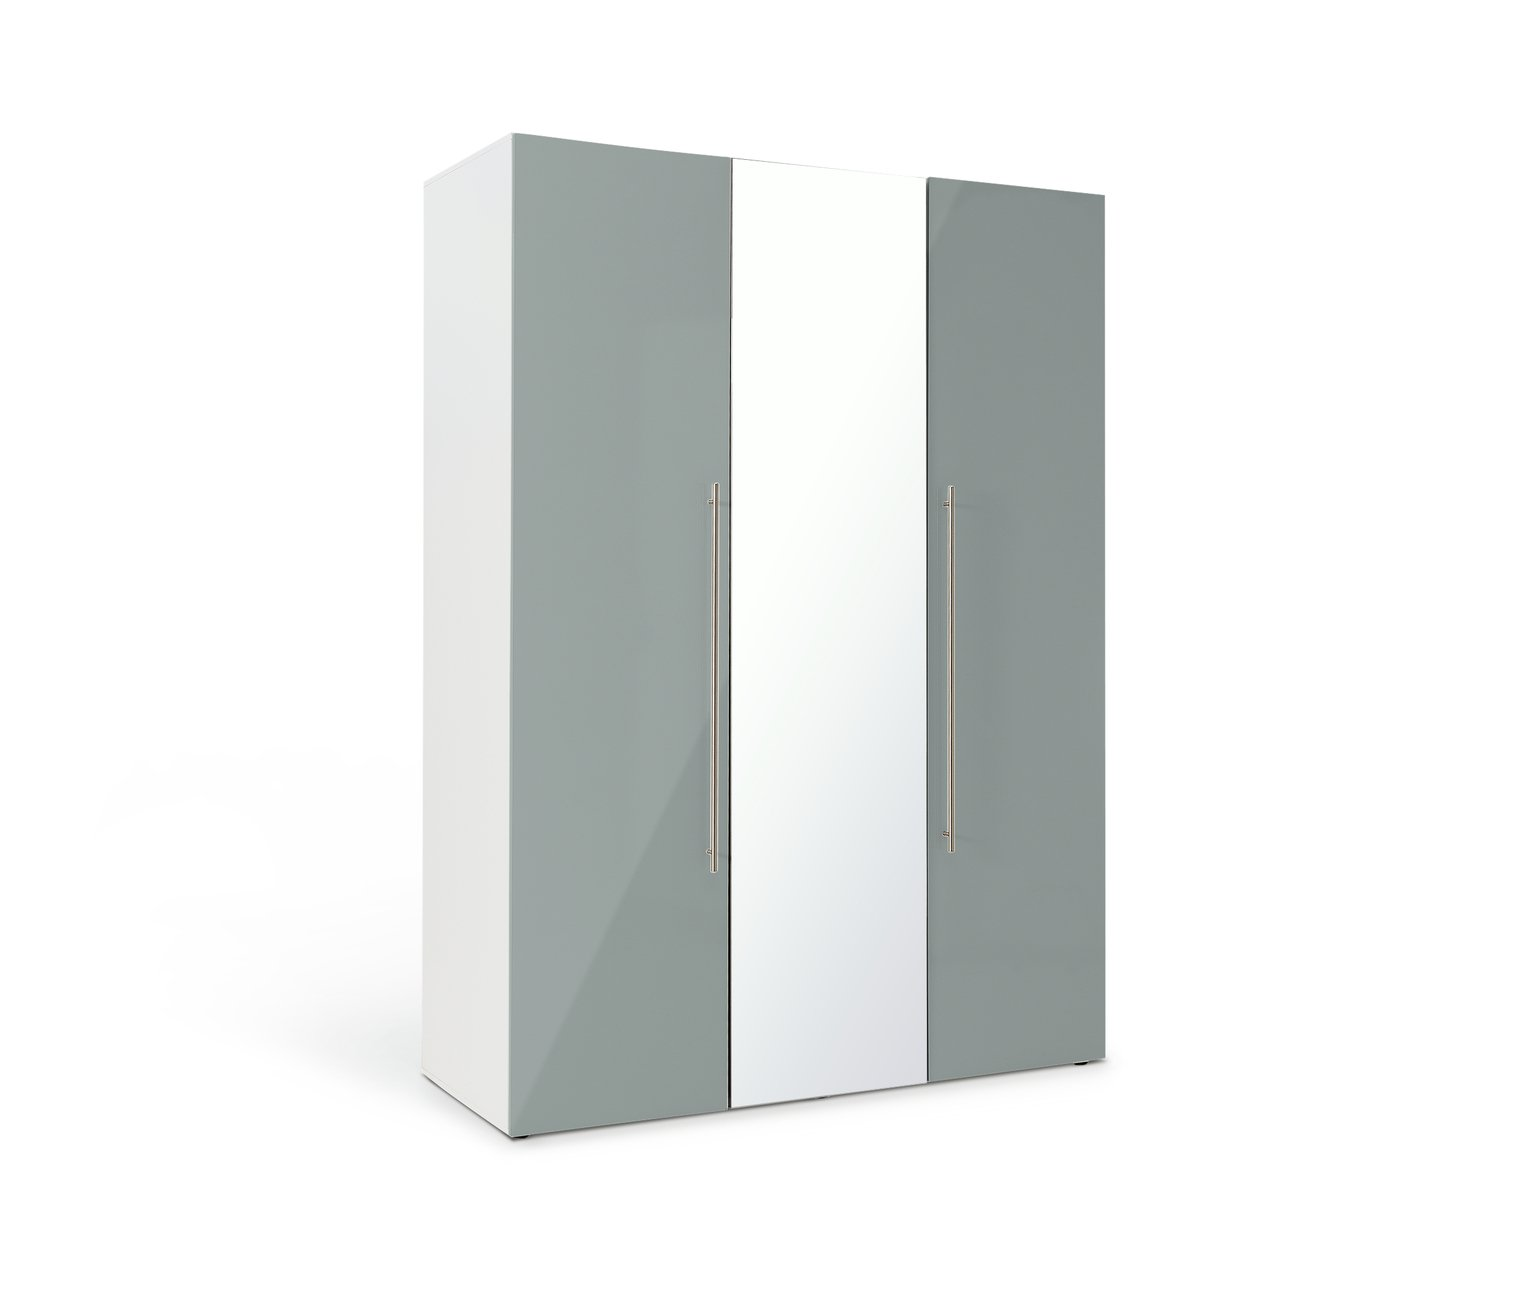 Argos Home Atlas 3 Door Mirrored Wardrobe - Grey Gloss & White at Argos